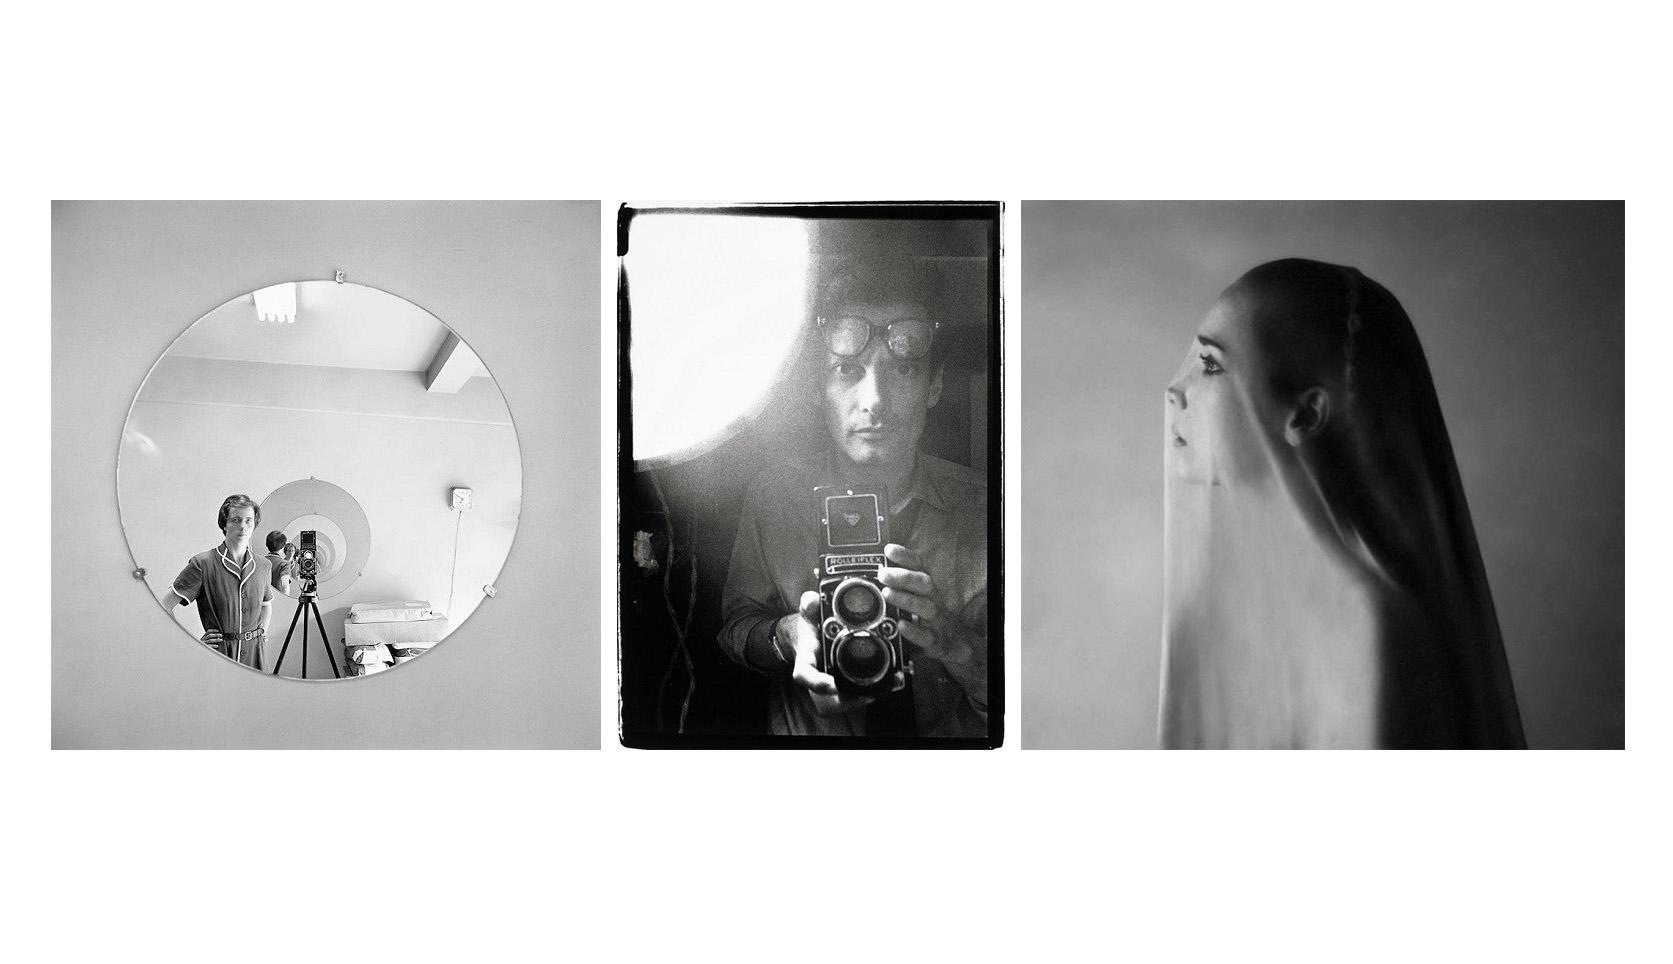 سلف پرتره های هنری عکاسان مشهور